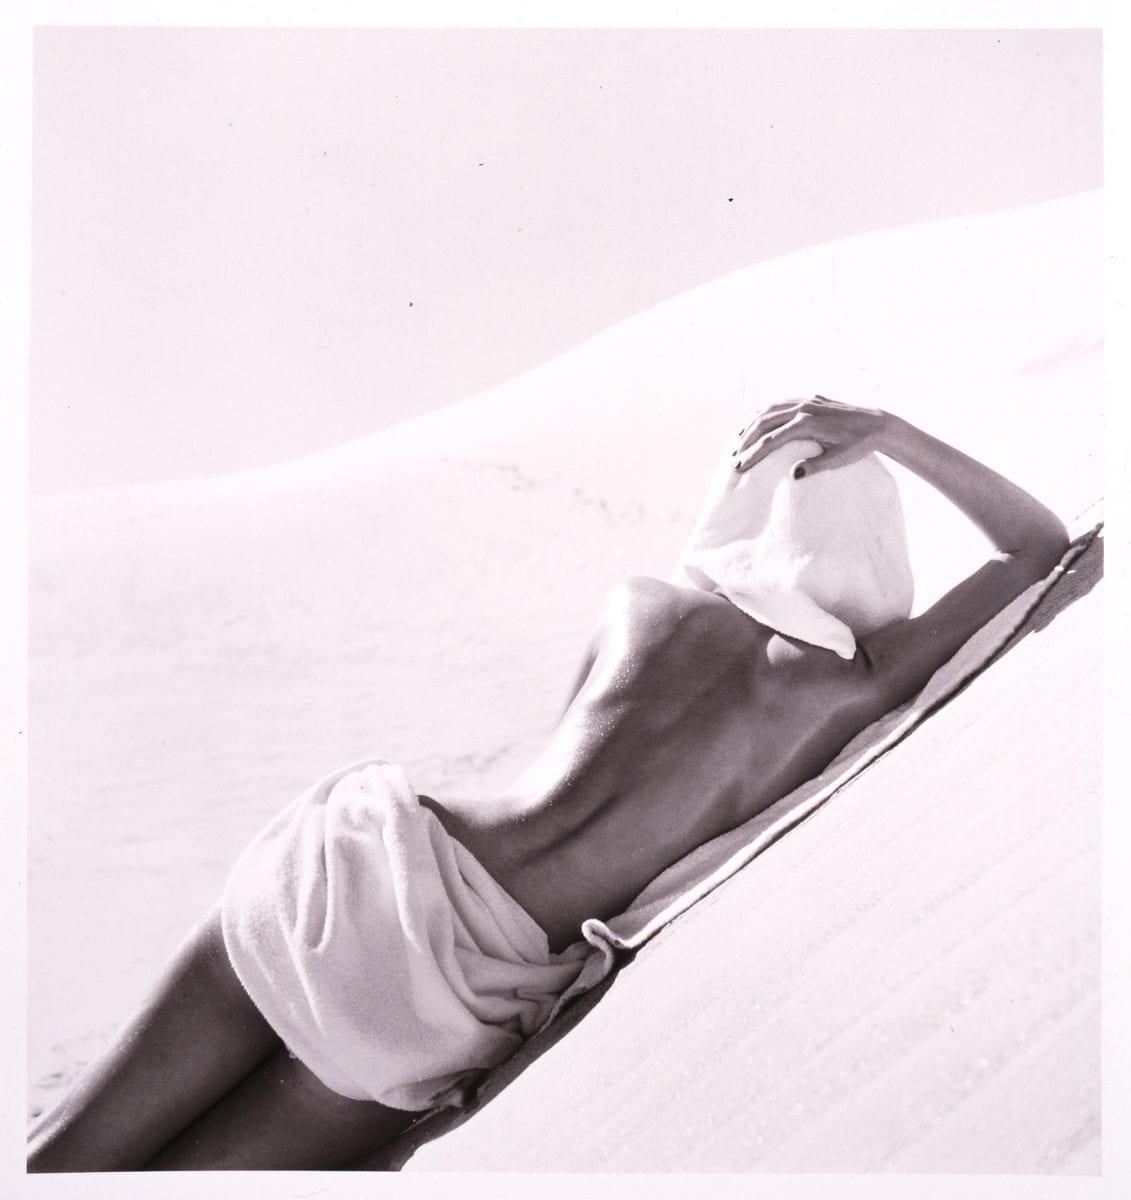 Louise Dahl-Wolfe, California Desert, 1948; Gelatin silver print, 14 x 11 in.; National Museum of Women in the Arts, Gift of Helen Cumming Ziegler; © 1989 Center for Creative Photography, Arizona Board of Regents